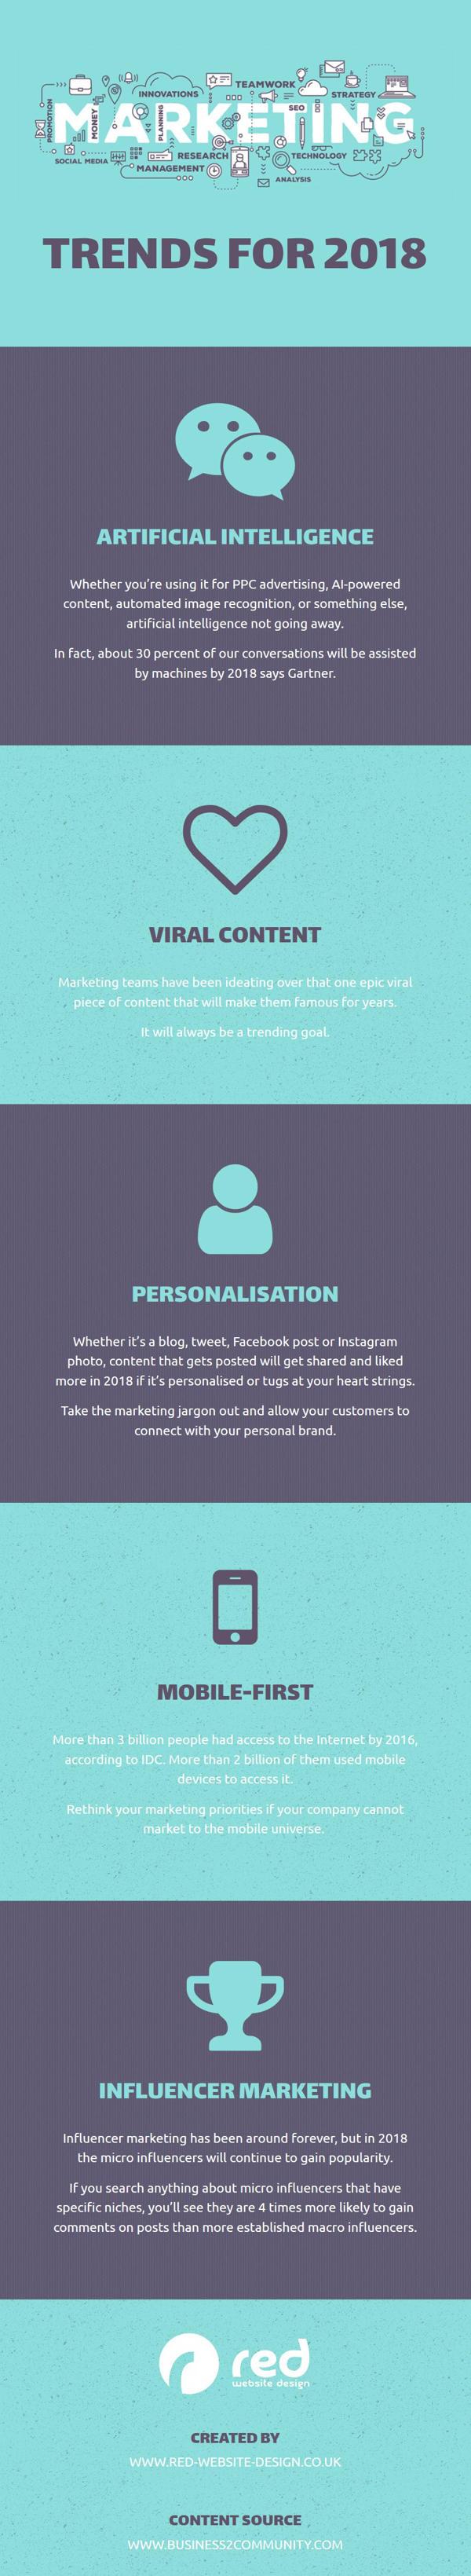 estrategias seo marketing infografia